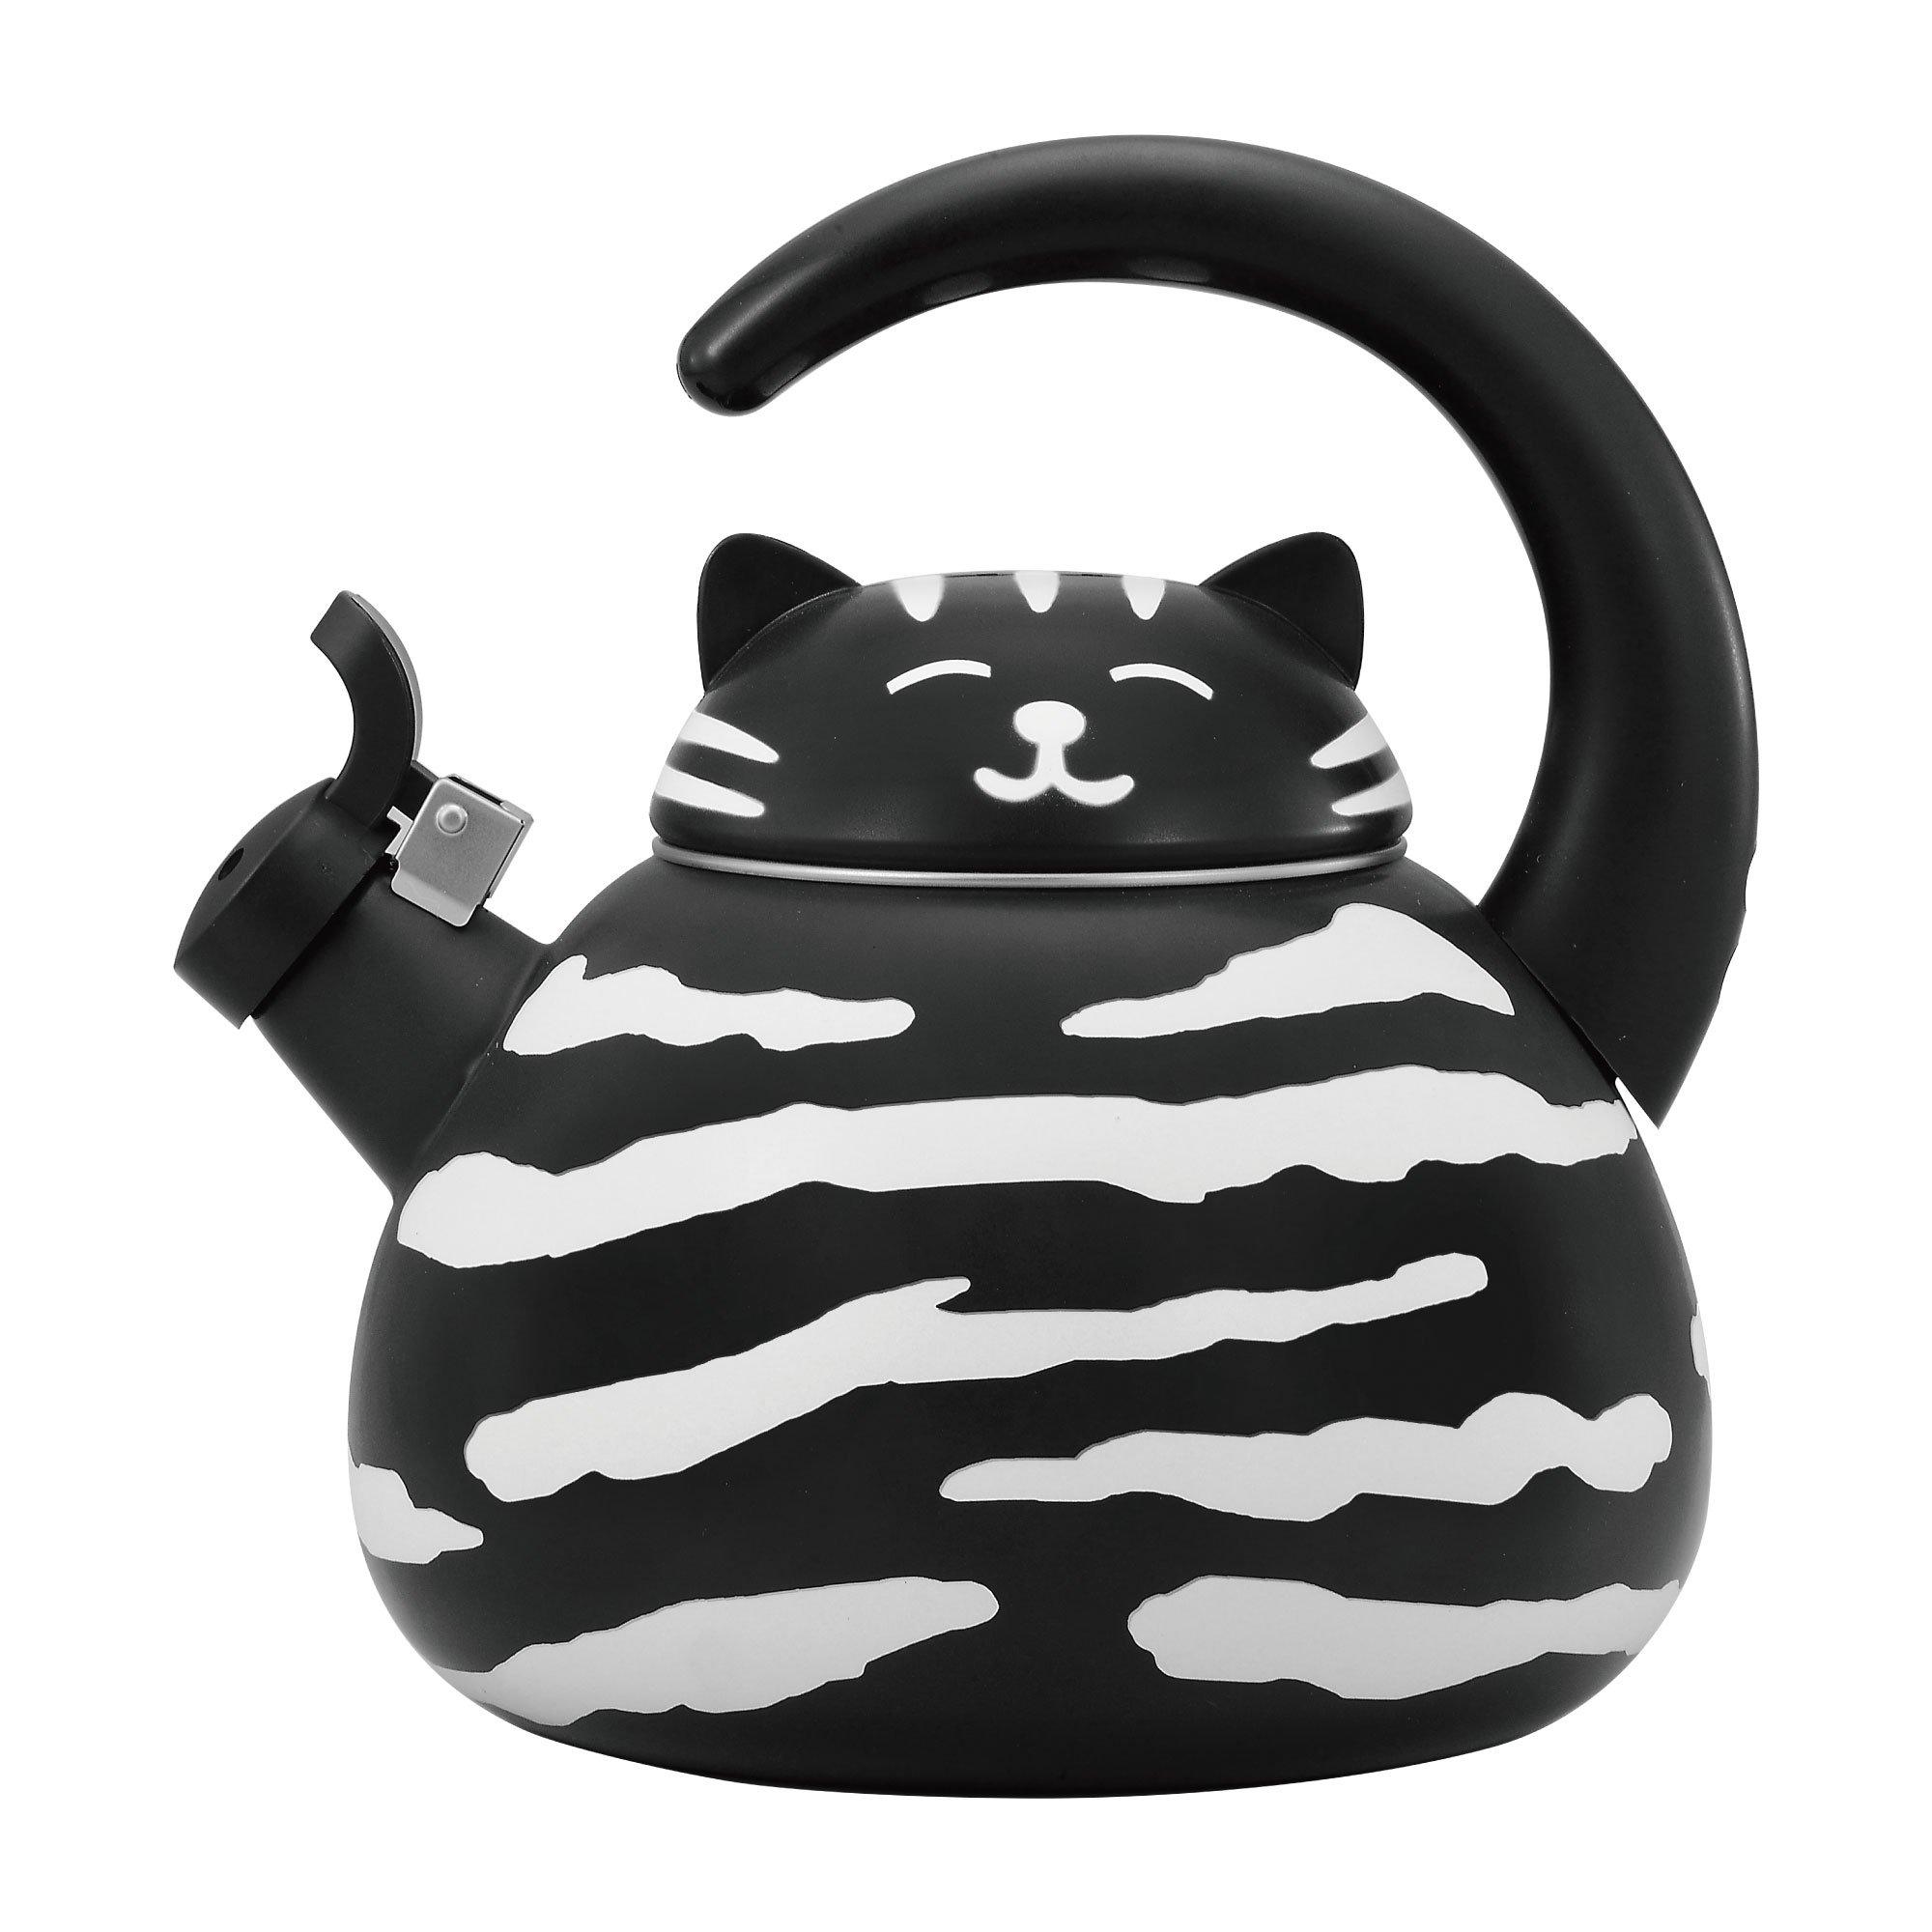 Supreme Housewares Gourmet Art Black Cat Enamel-on-Steel Whistling Kettle by Supreme Housewares (Image #1)